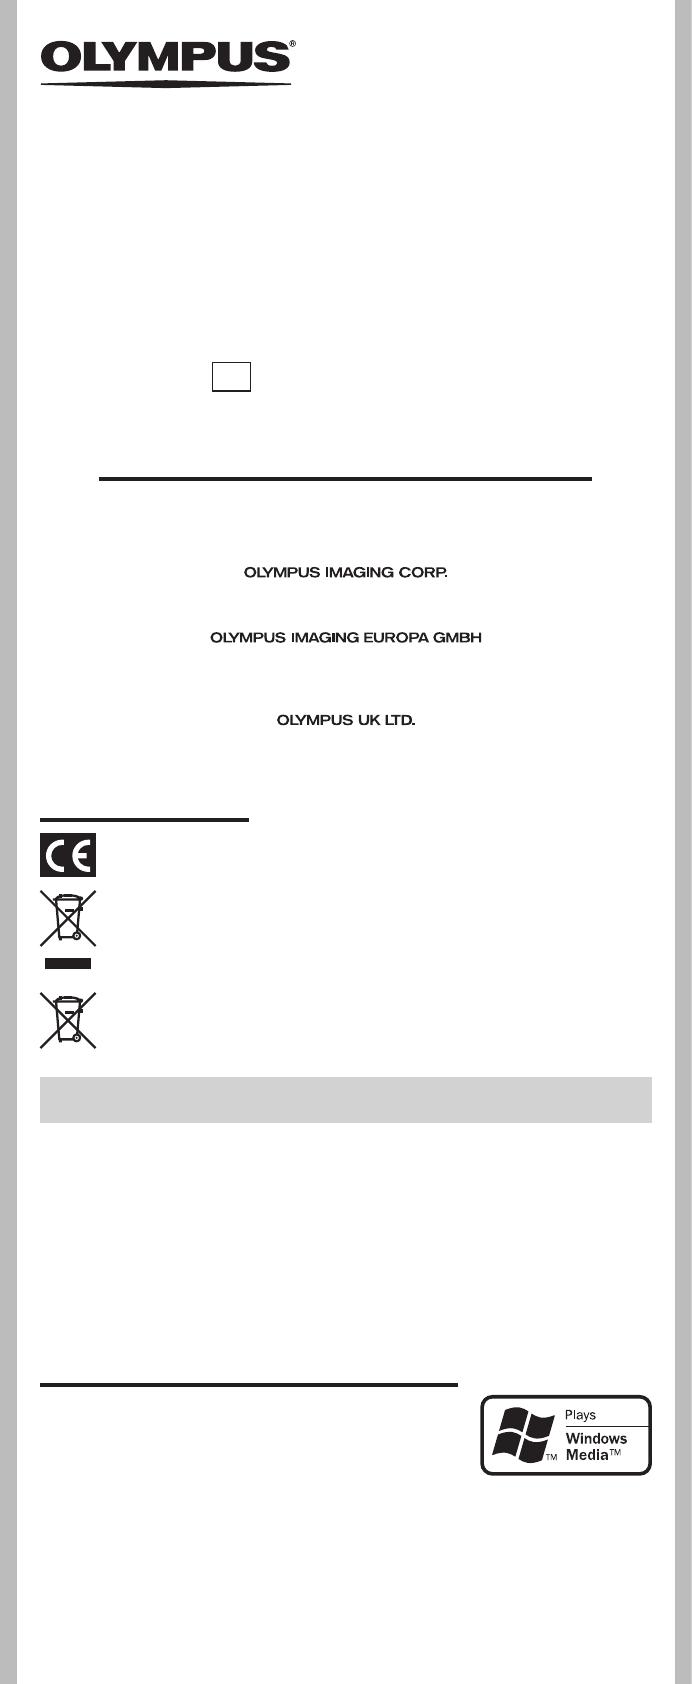 Handleiding Olympus VN-5500PC (pagina 1 van 12) (Nederlands)